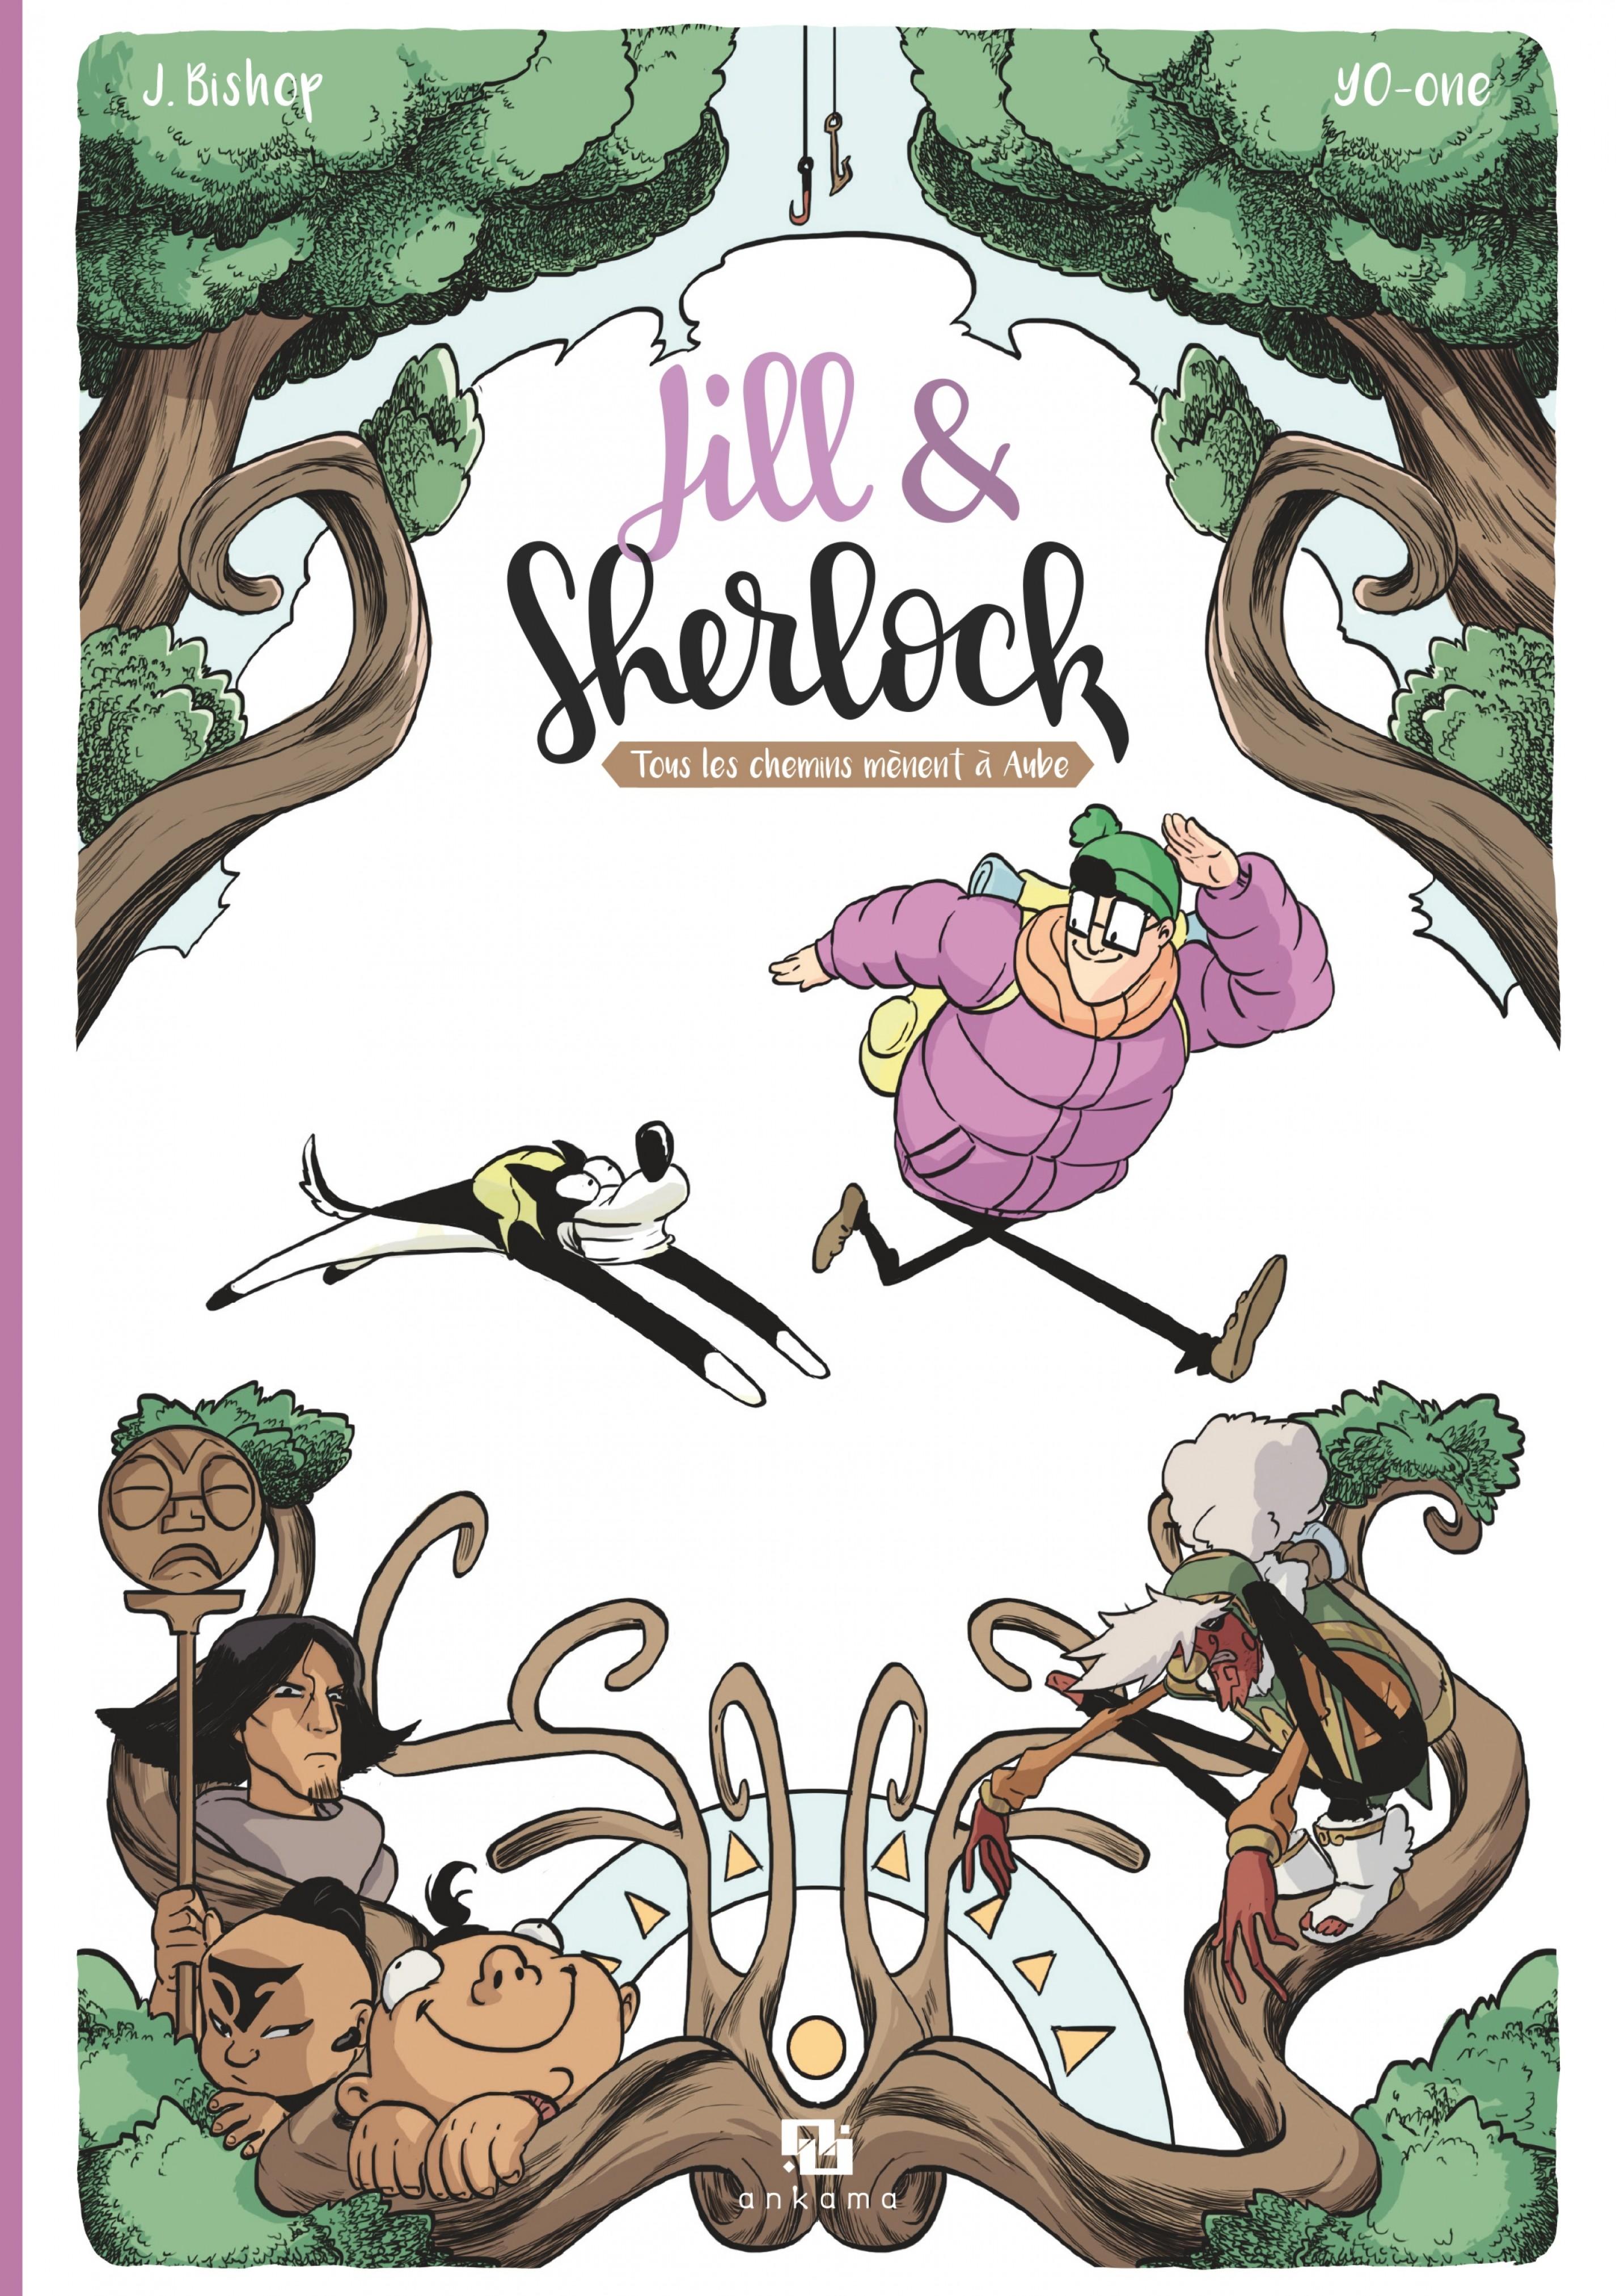 Jill et Sherlock - Jill et Sherlock : Tous les chemins mènent à Aube